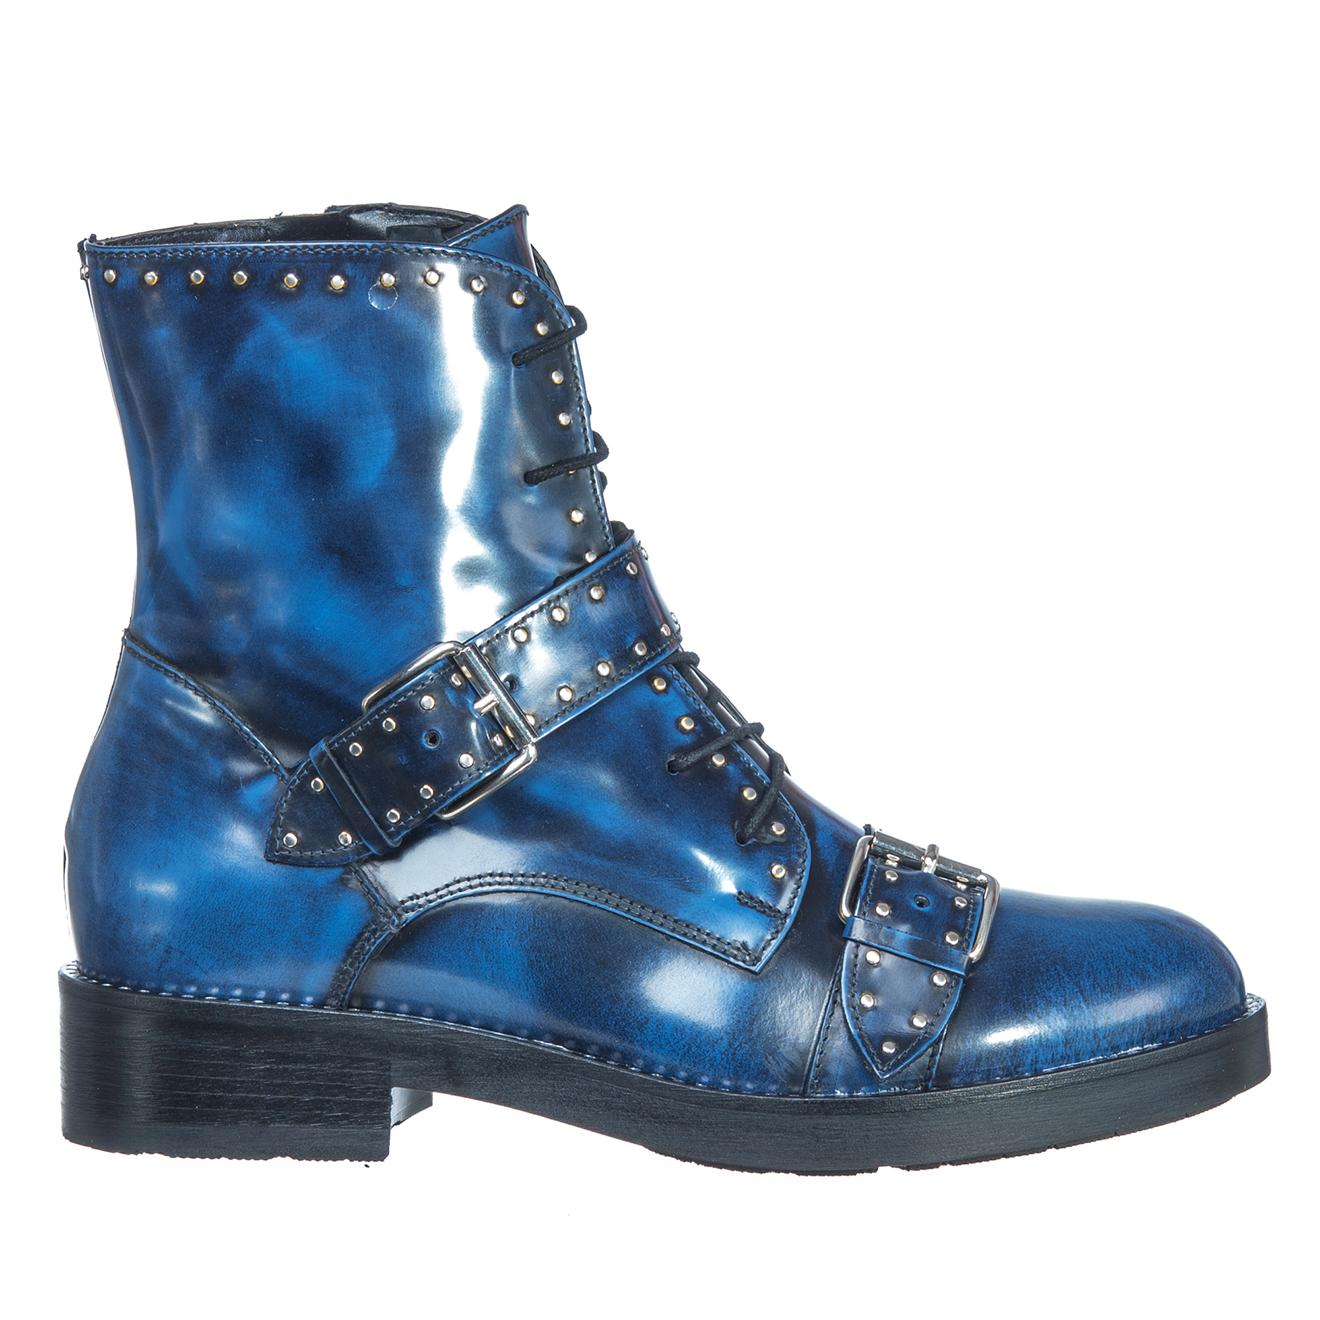 Boots en Cuir Marine bleues